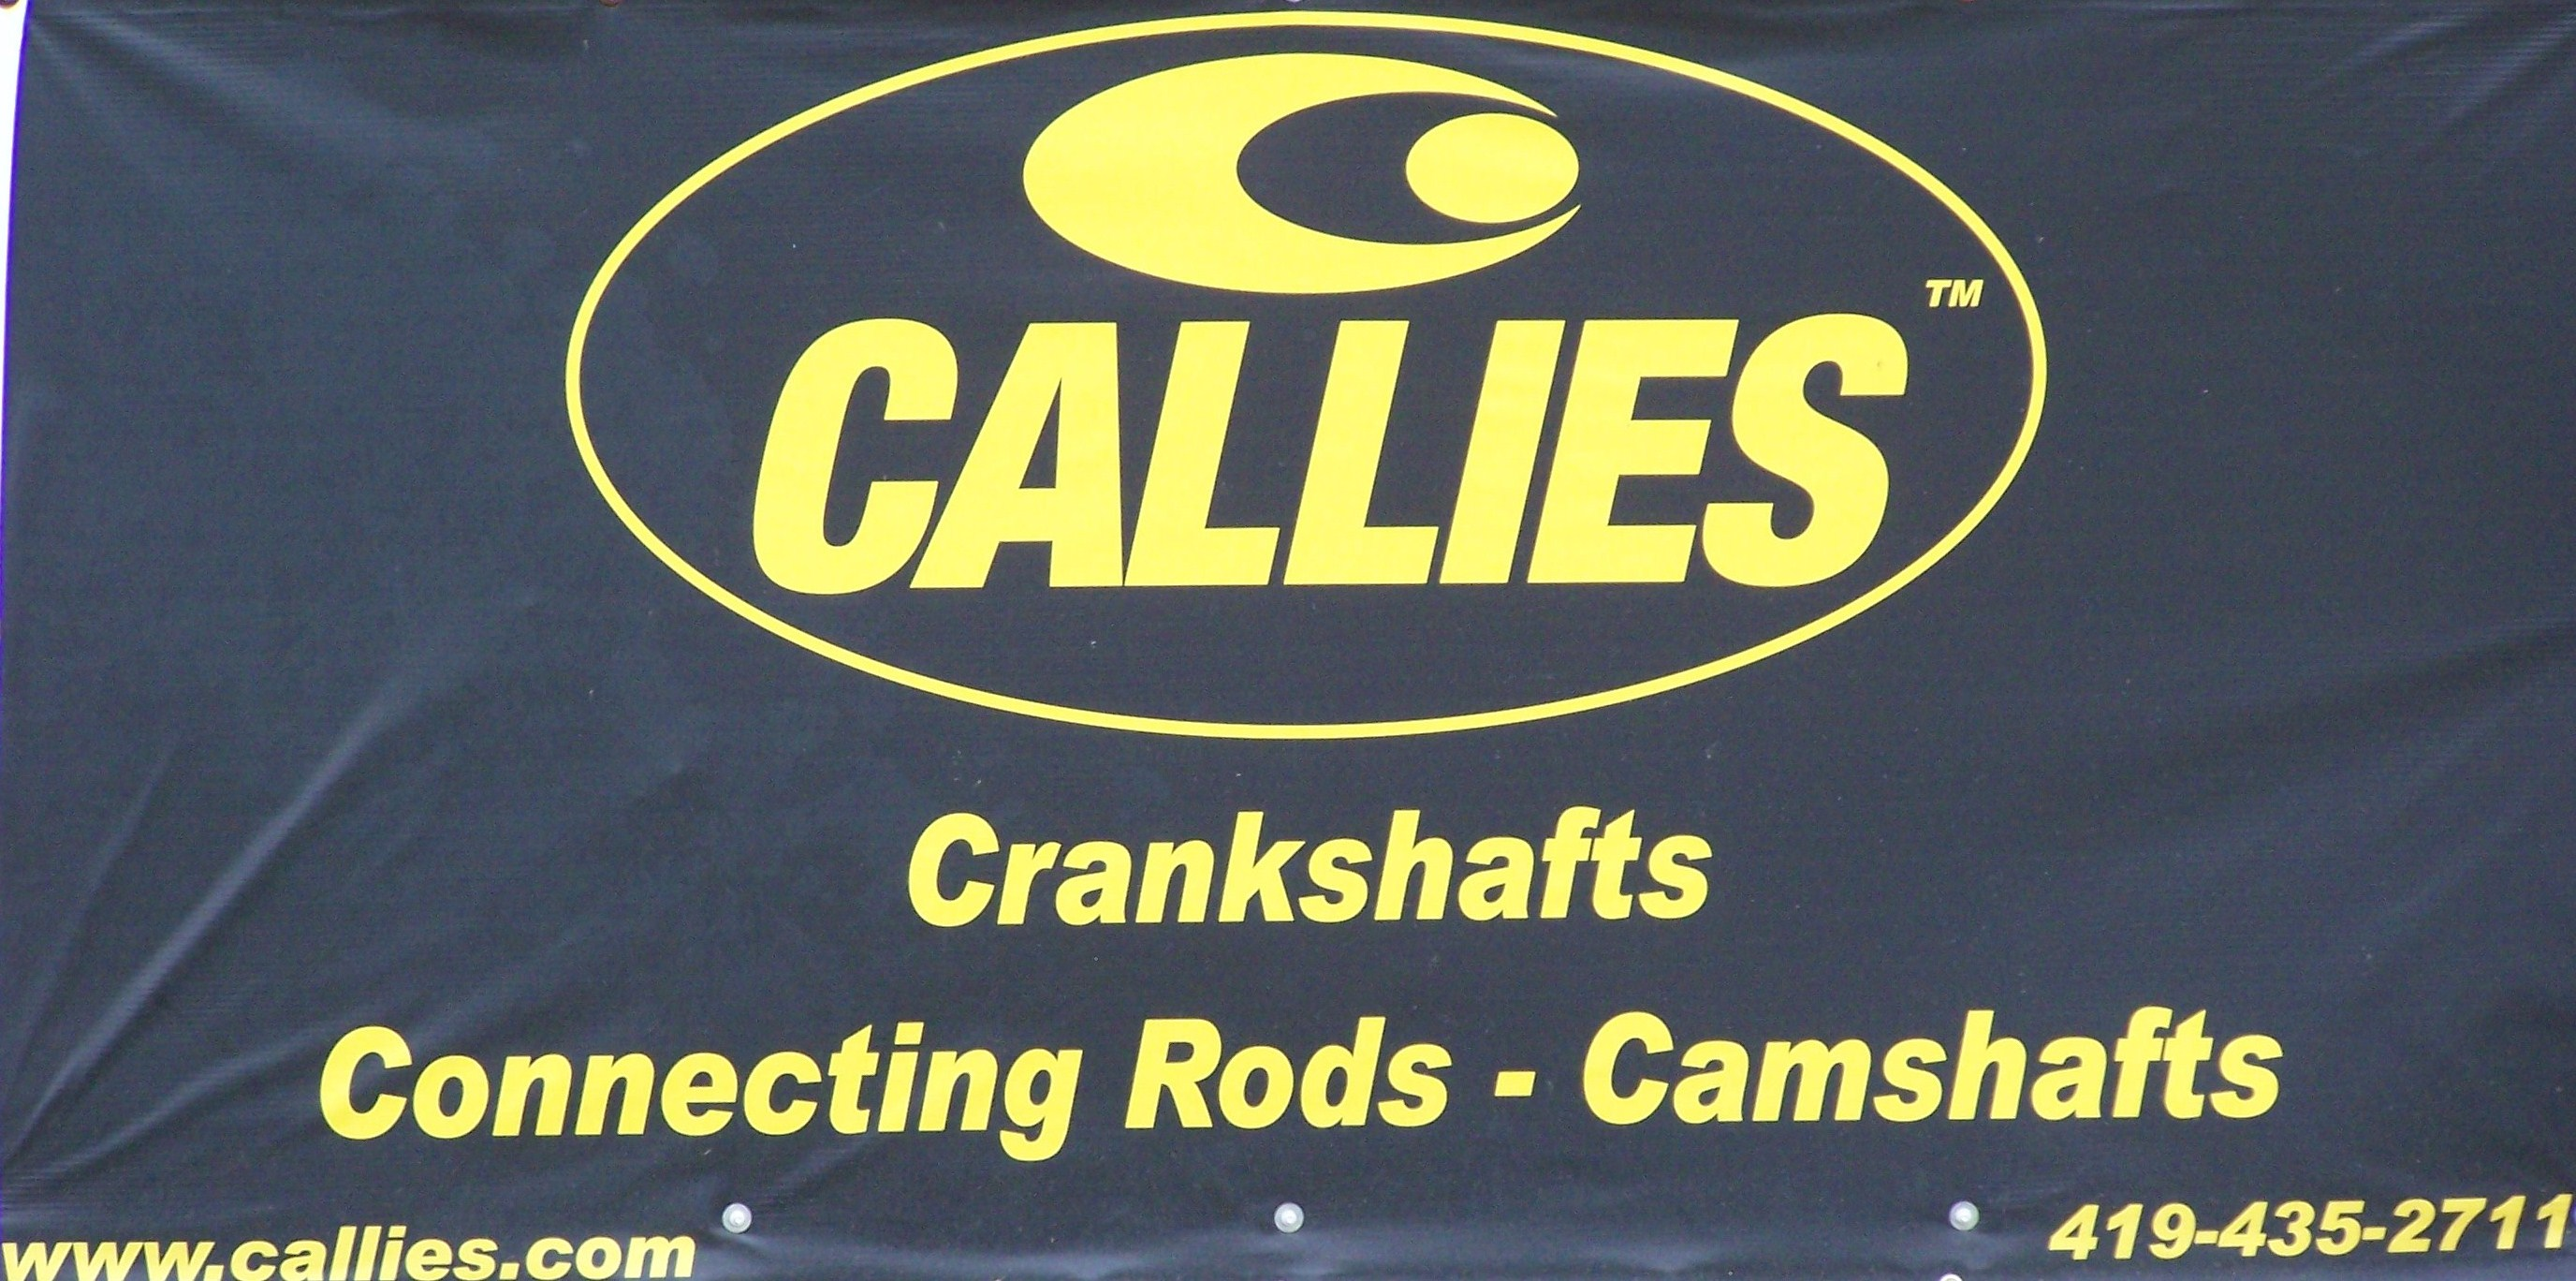 Callies